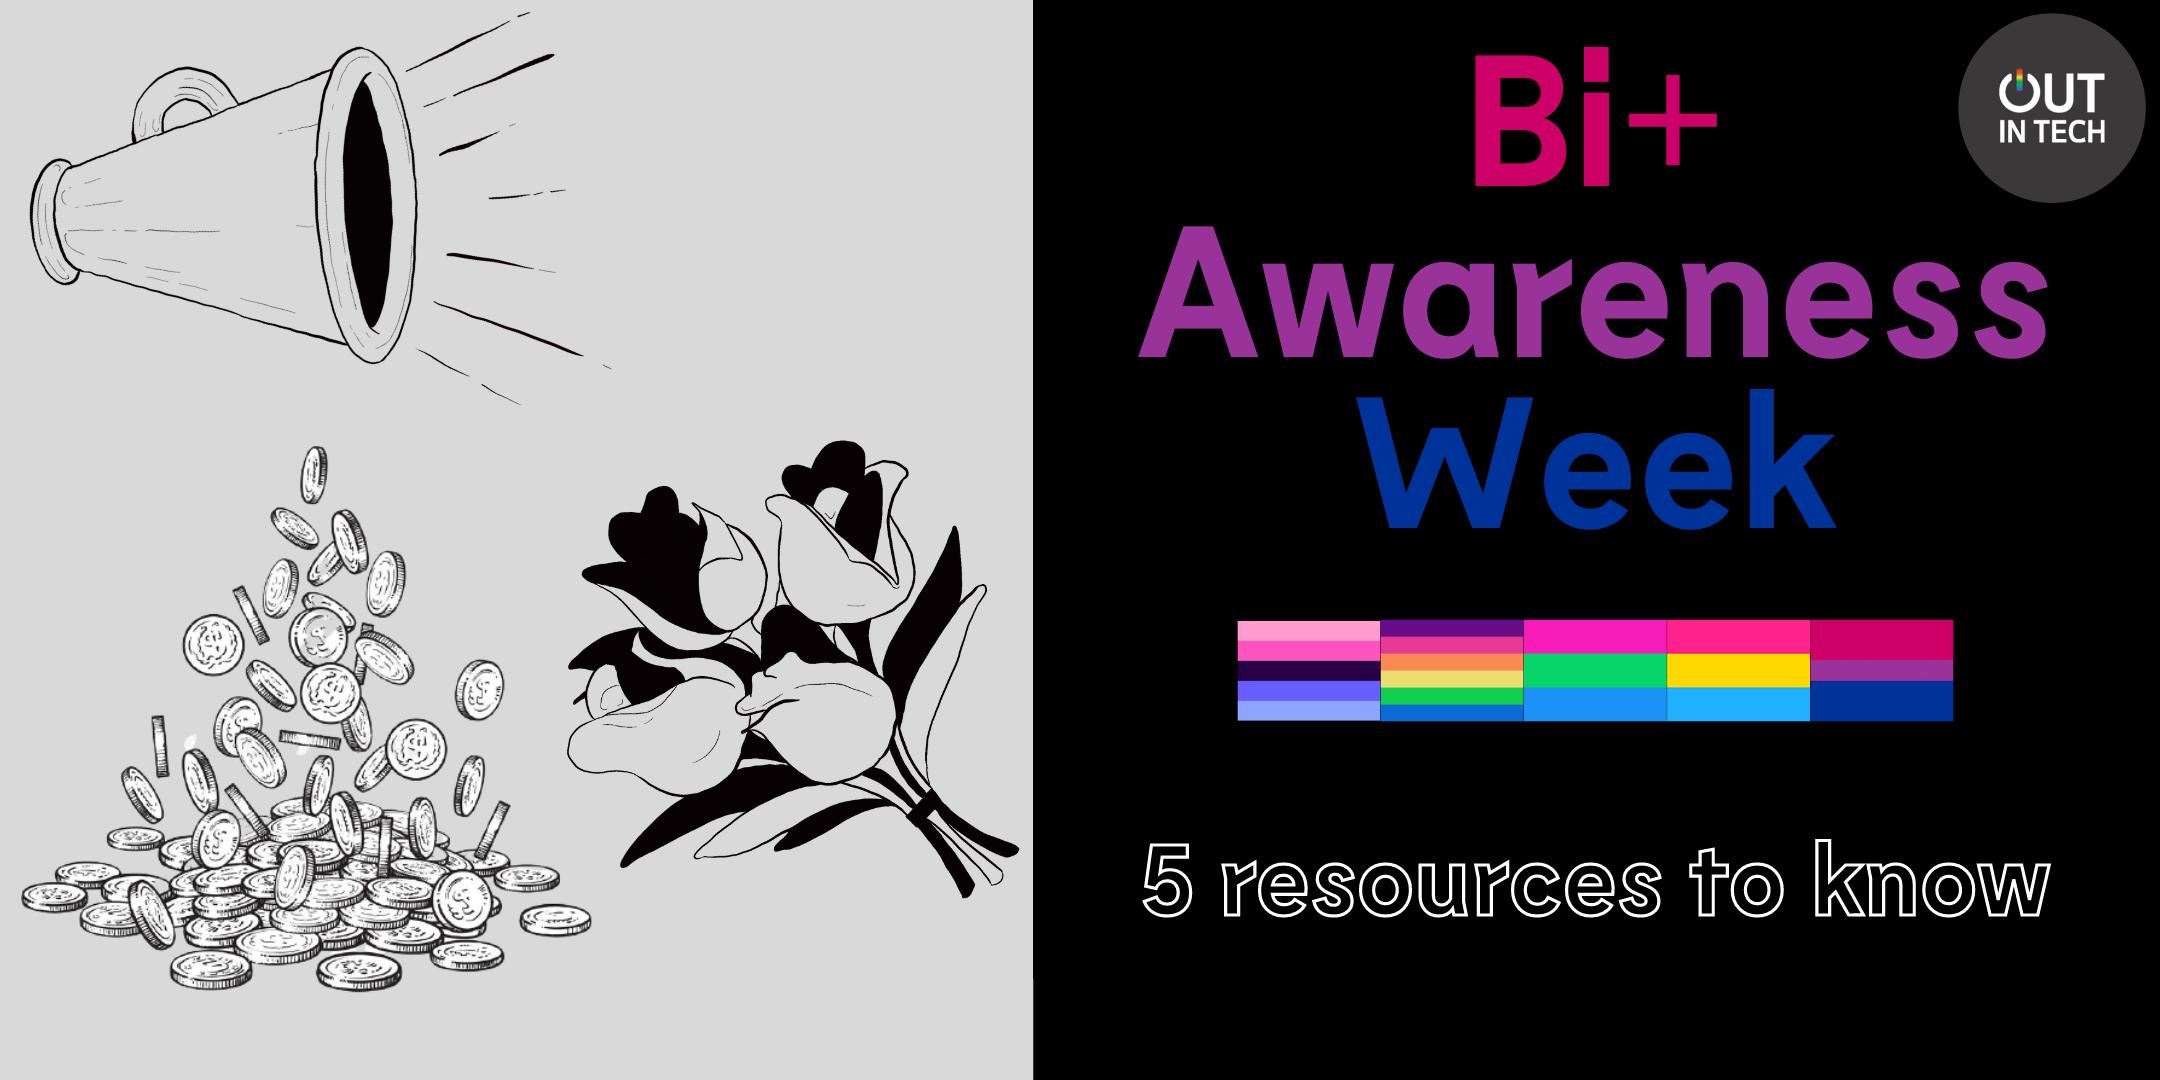 Bi+ Awareness Week: 5 Resources To Know